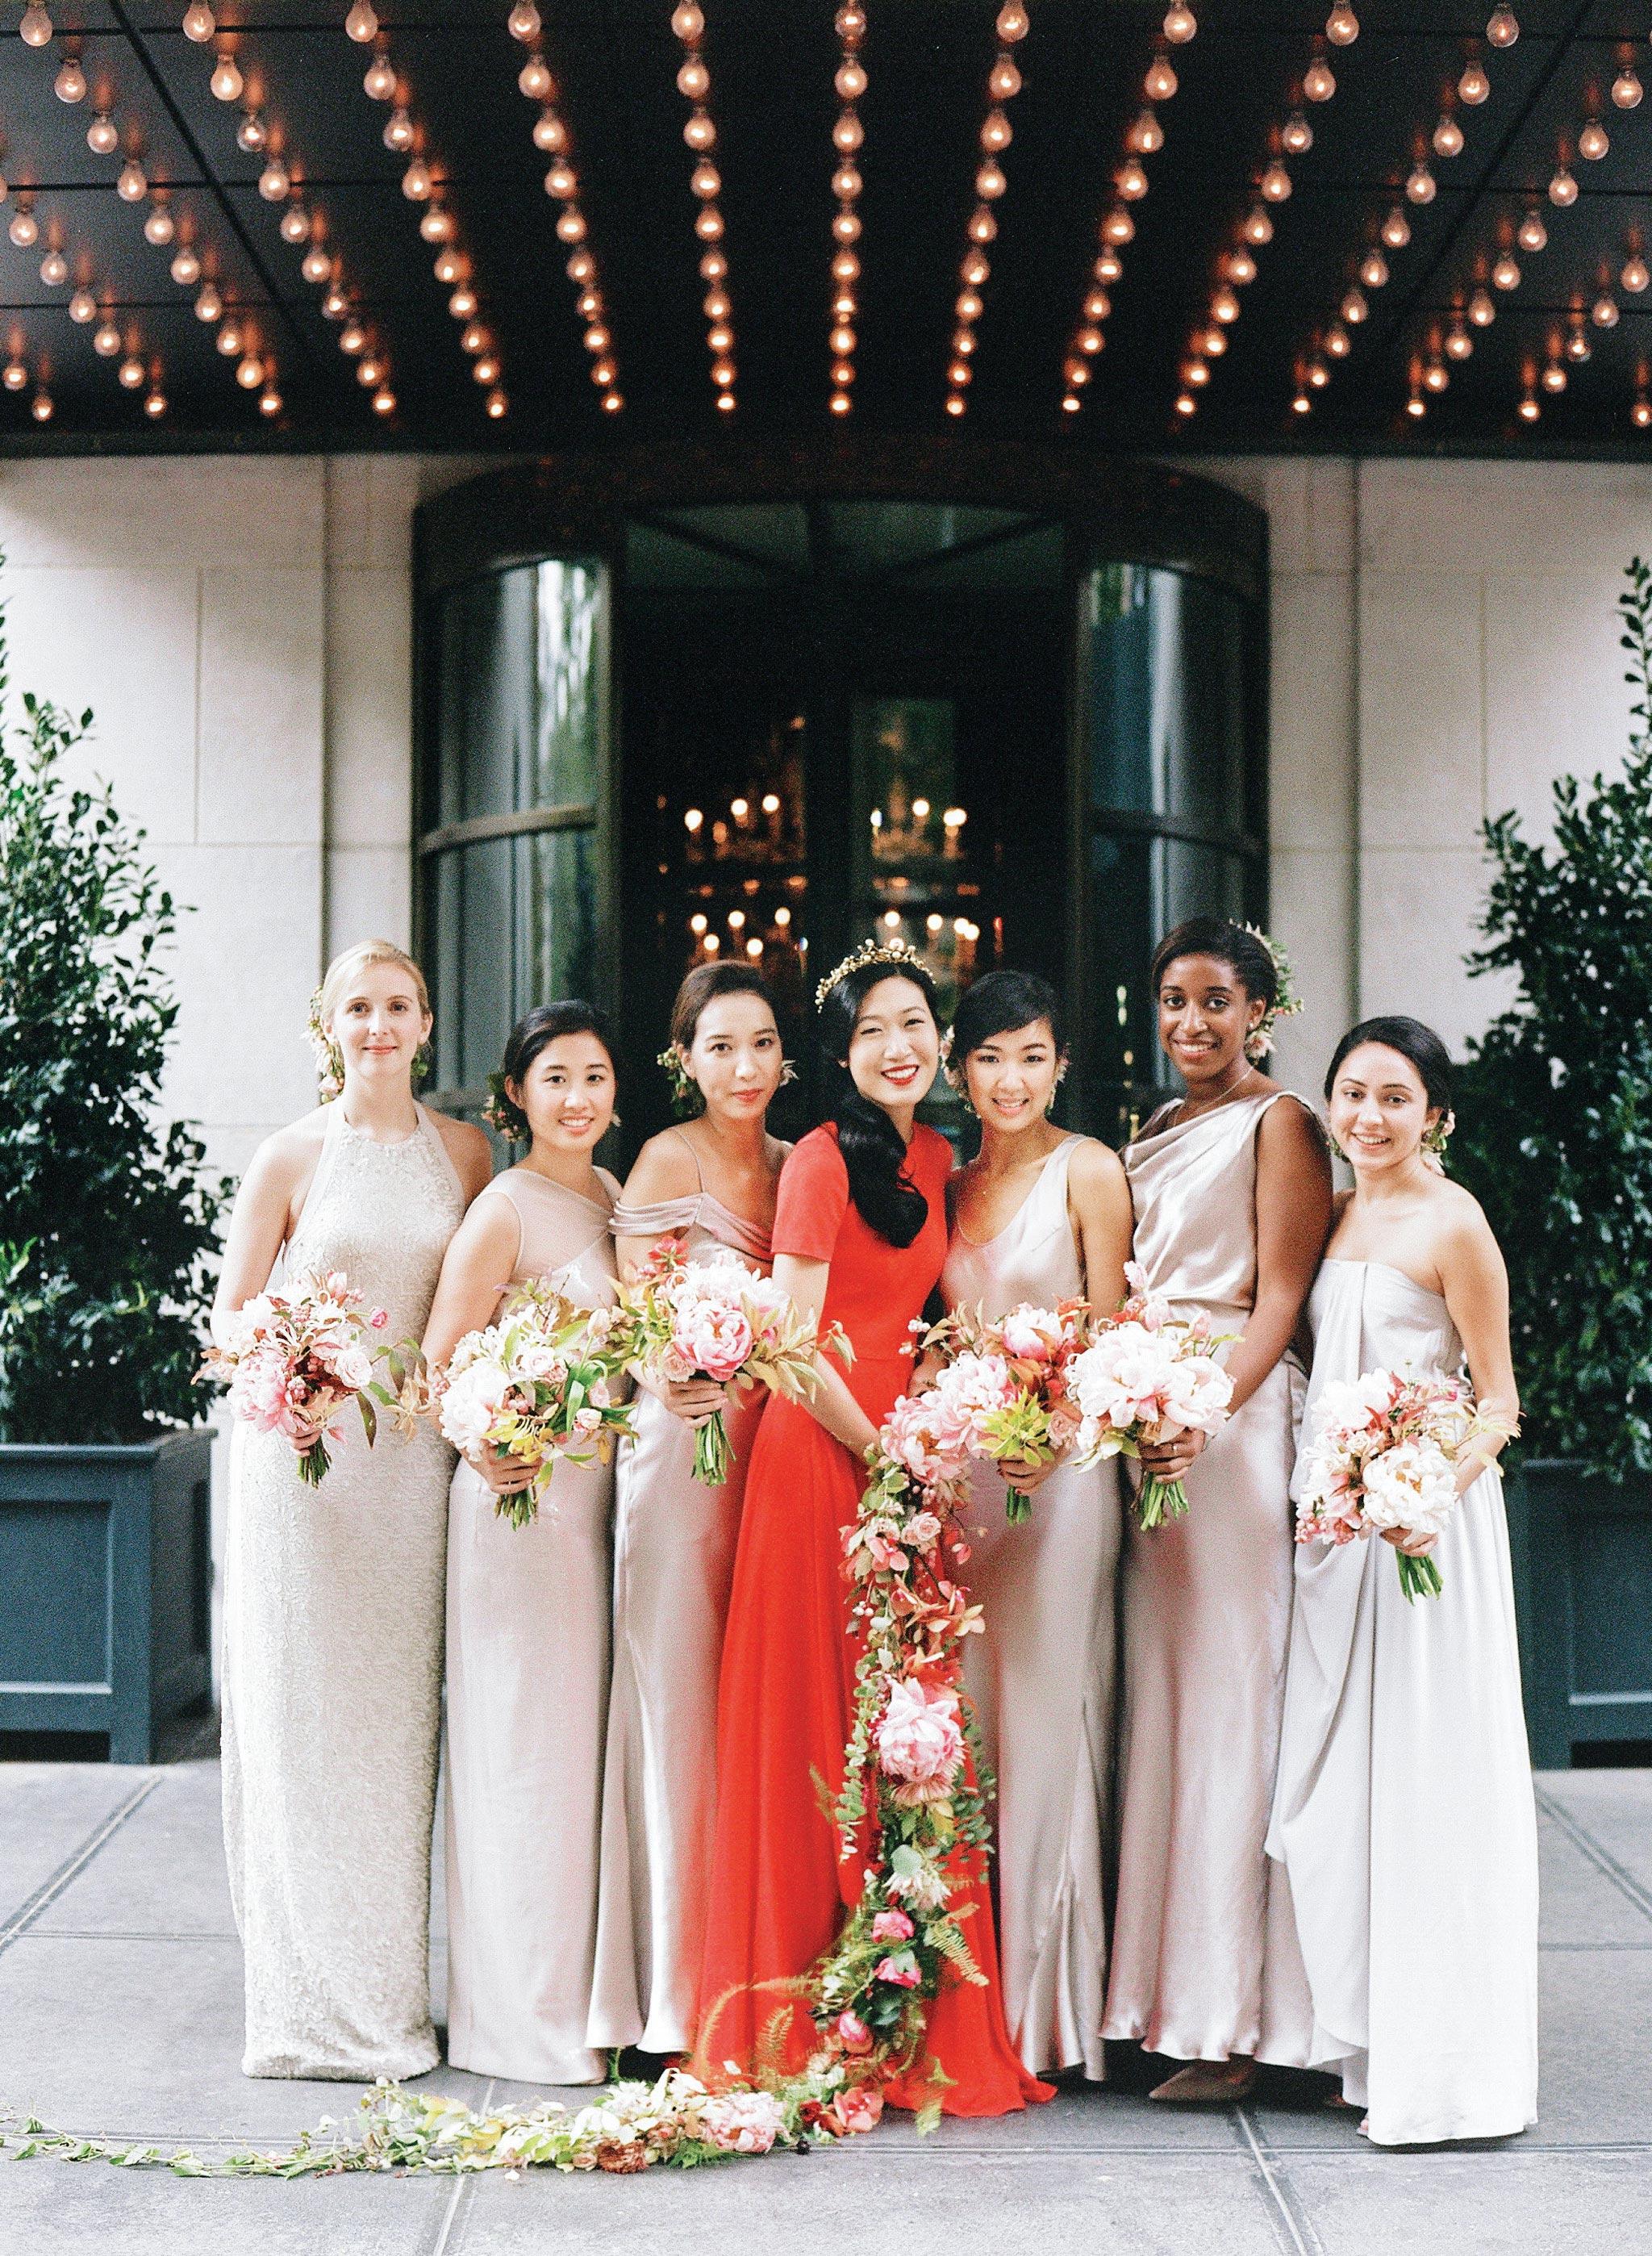 glara matthew wedding bridesmaids